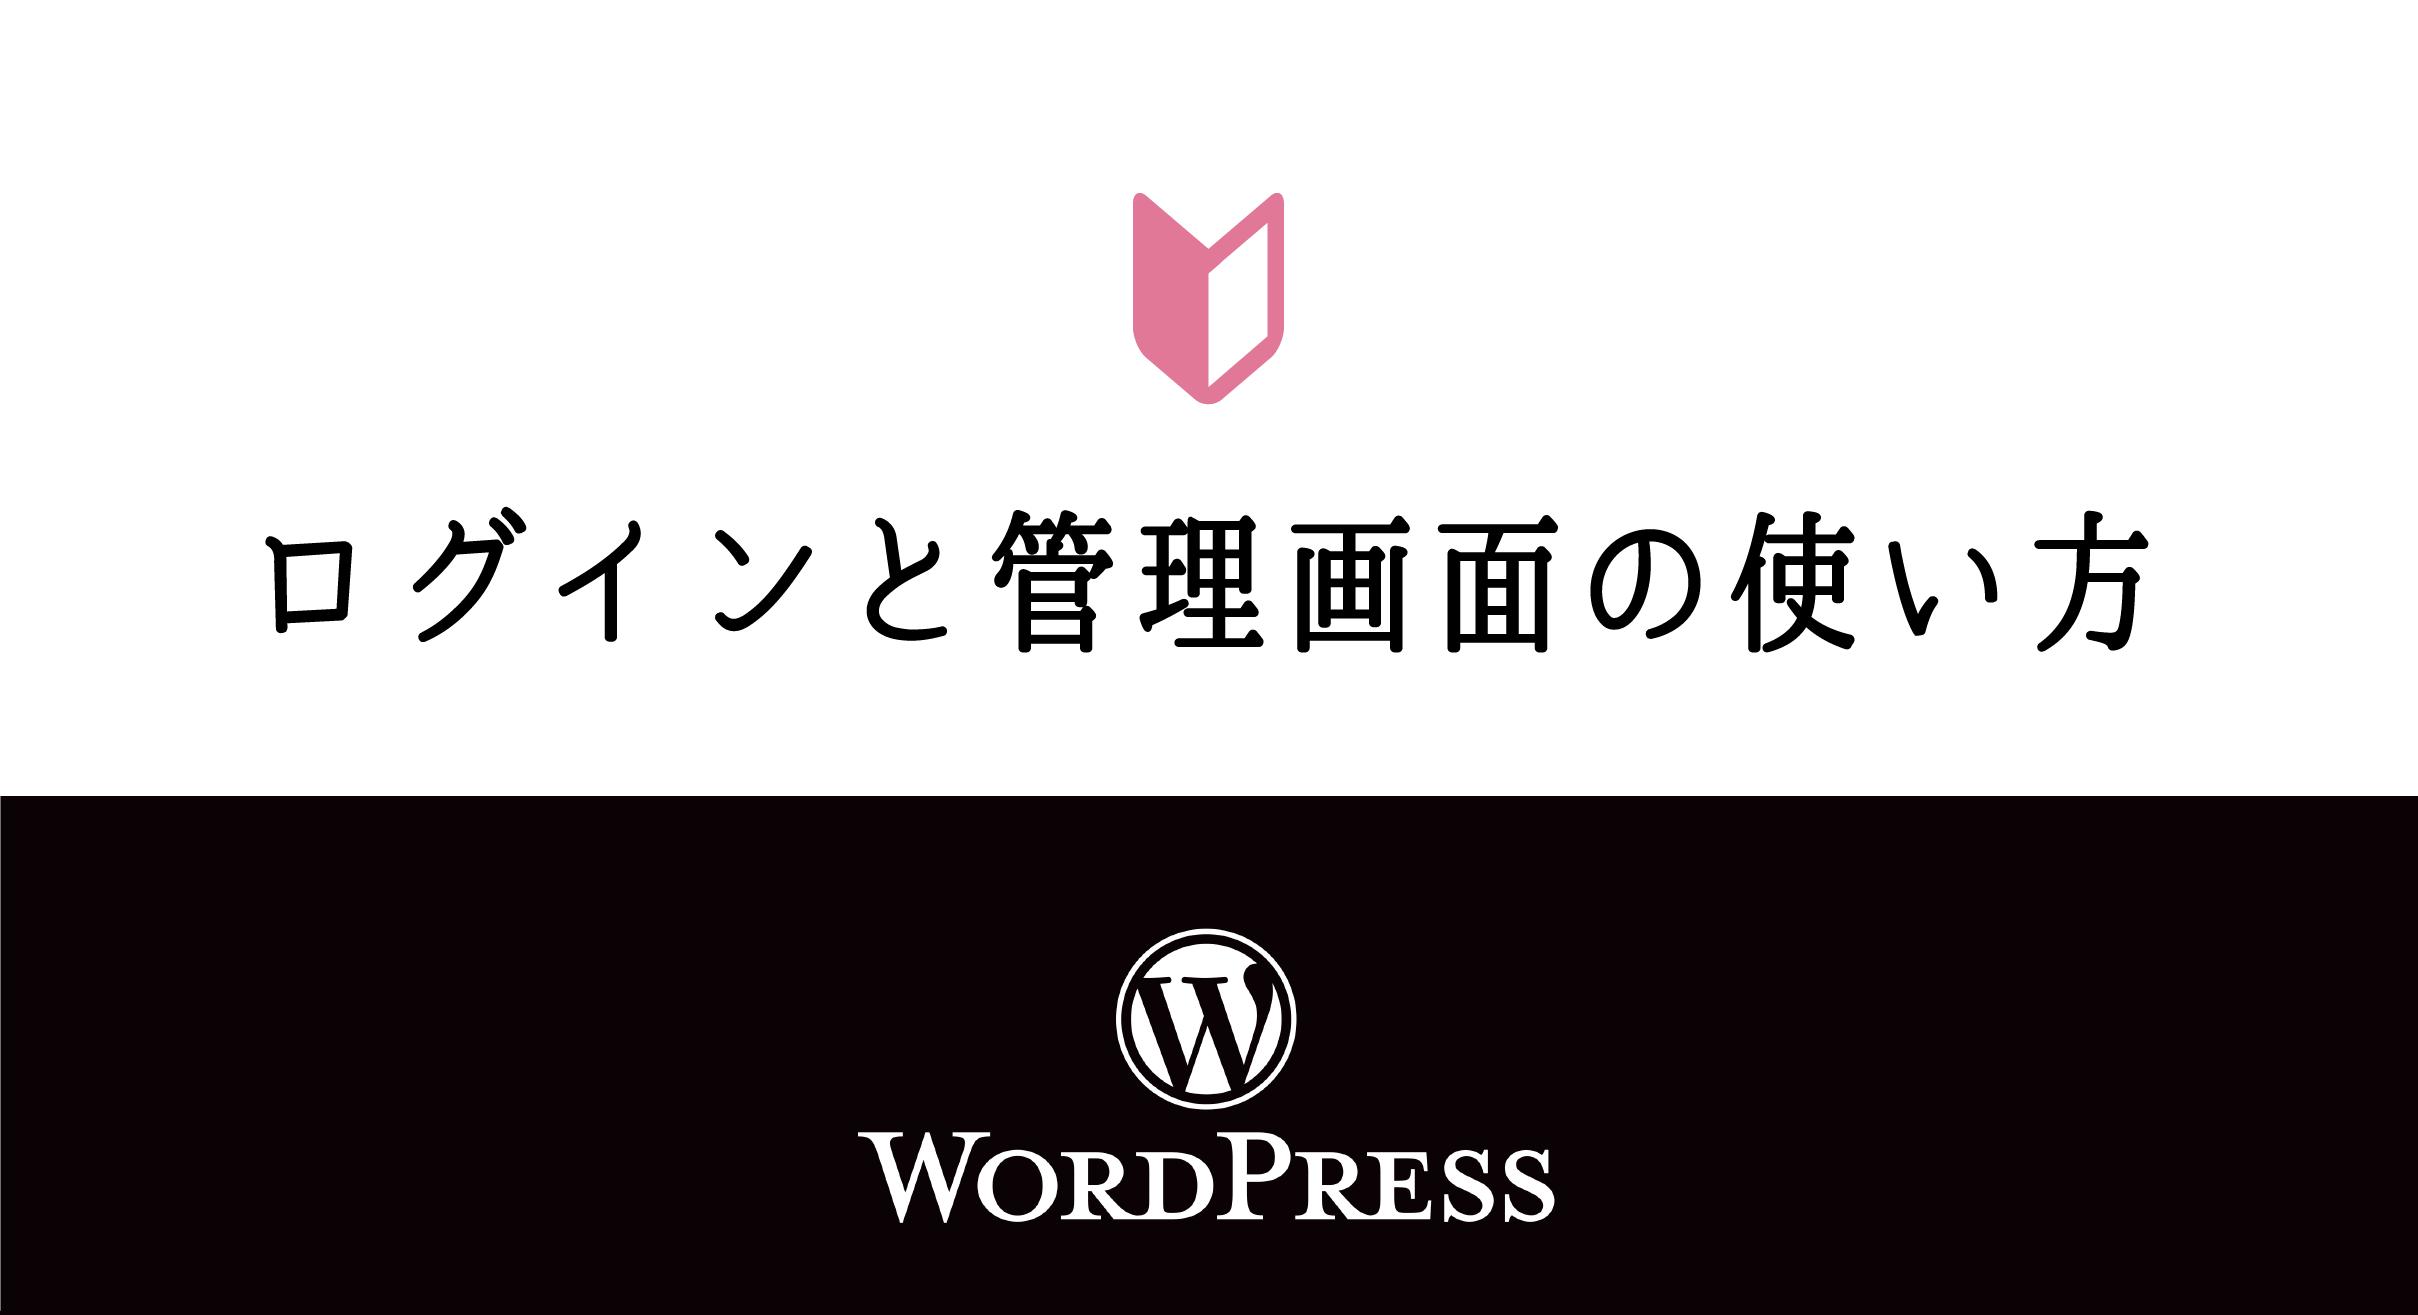 WordPress管理画面のログインと使い方!基本的な操作方法と設定方法